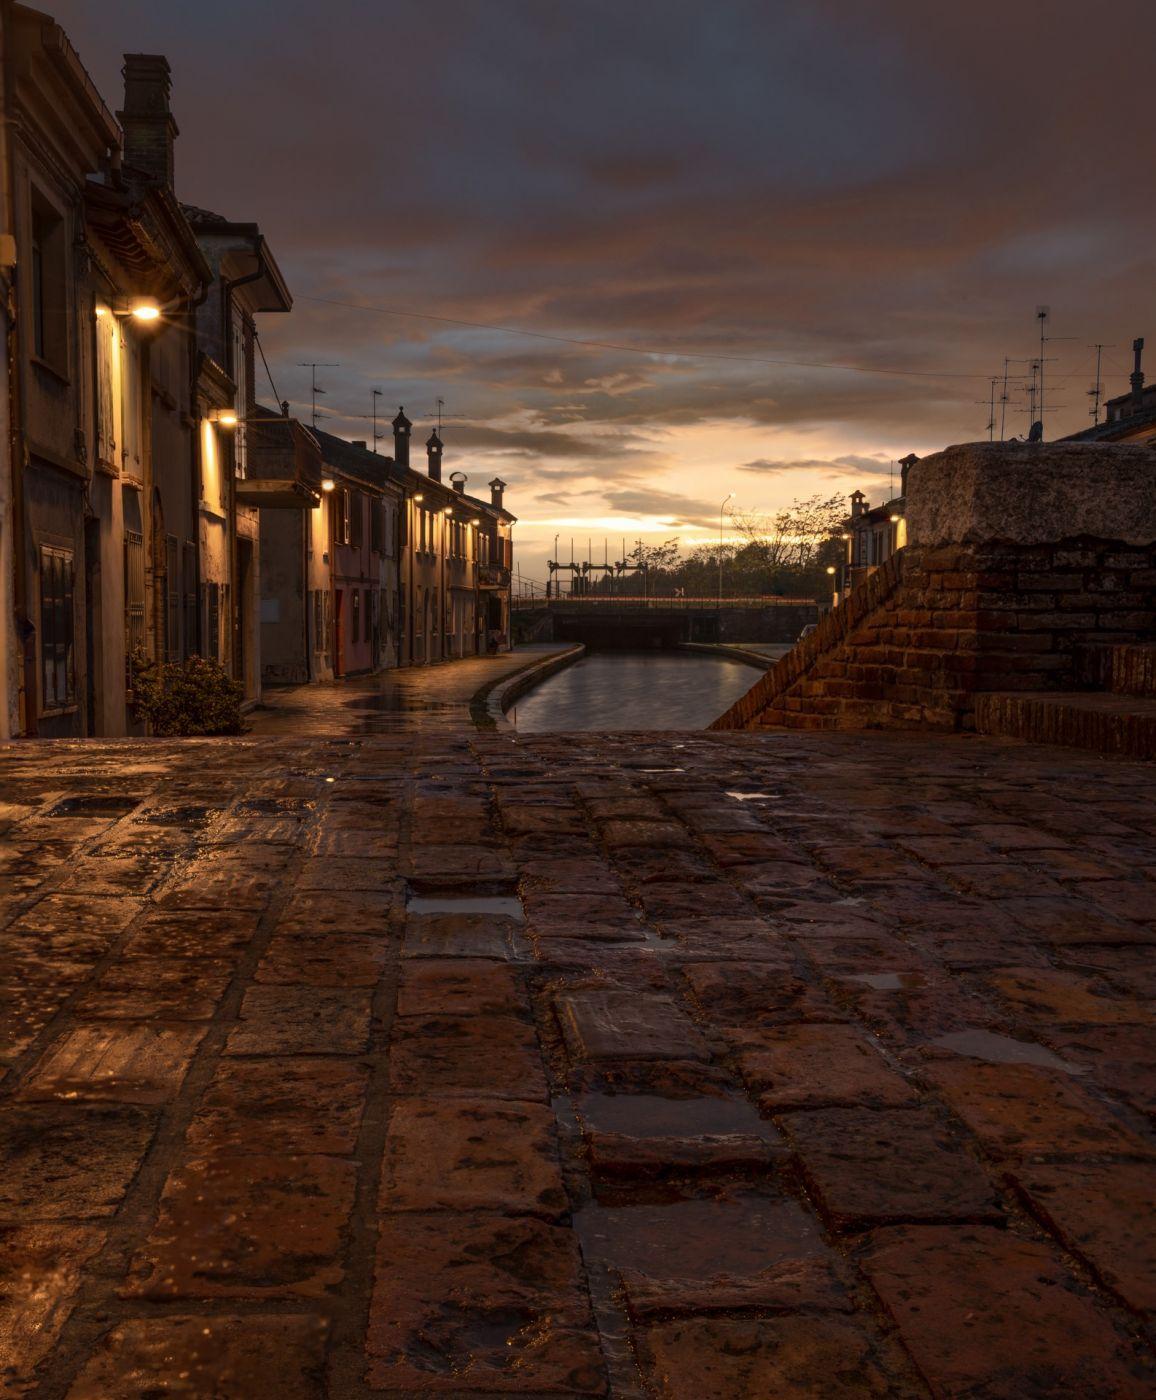 Sunset landscape, Italy